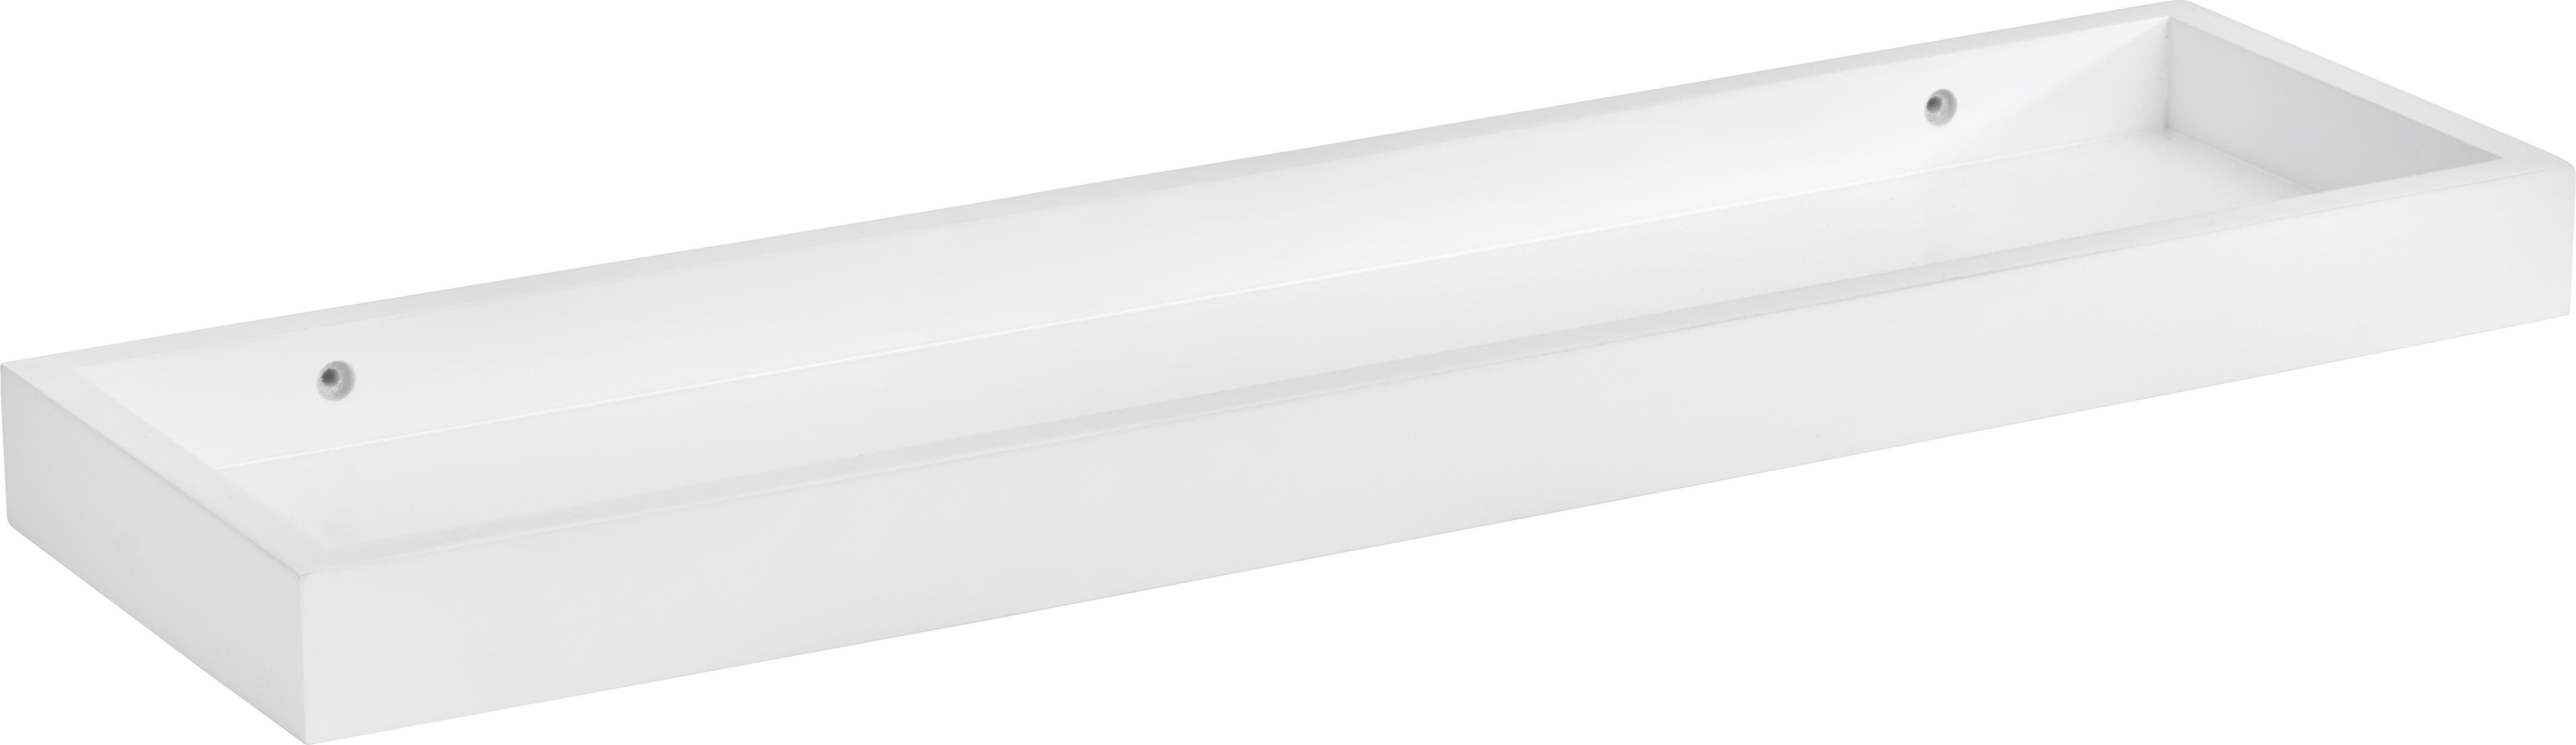 Falipolc Vallerie -sb- - fehér, romantikus/Landhaus, faanyagok (60/4/16,9cm) - MÖMAX modern living